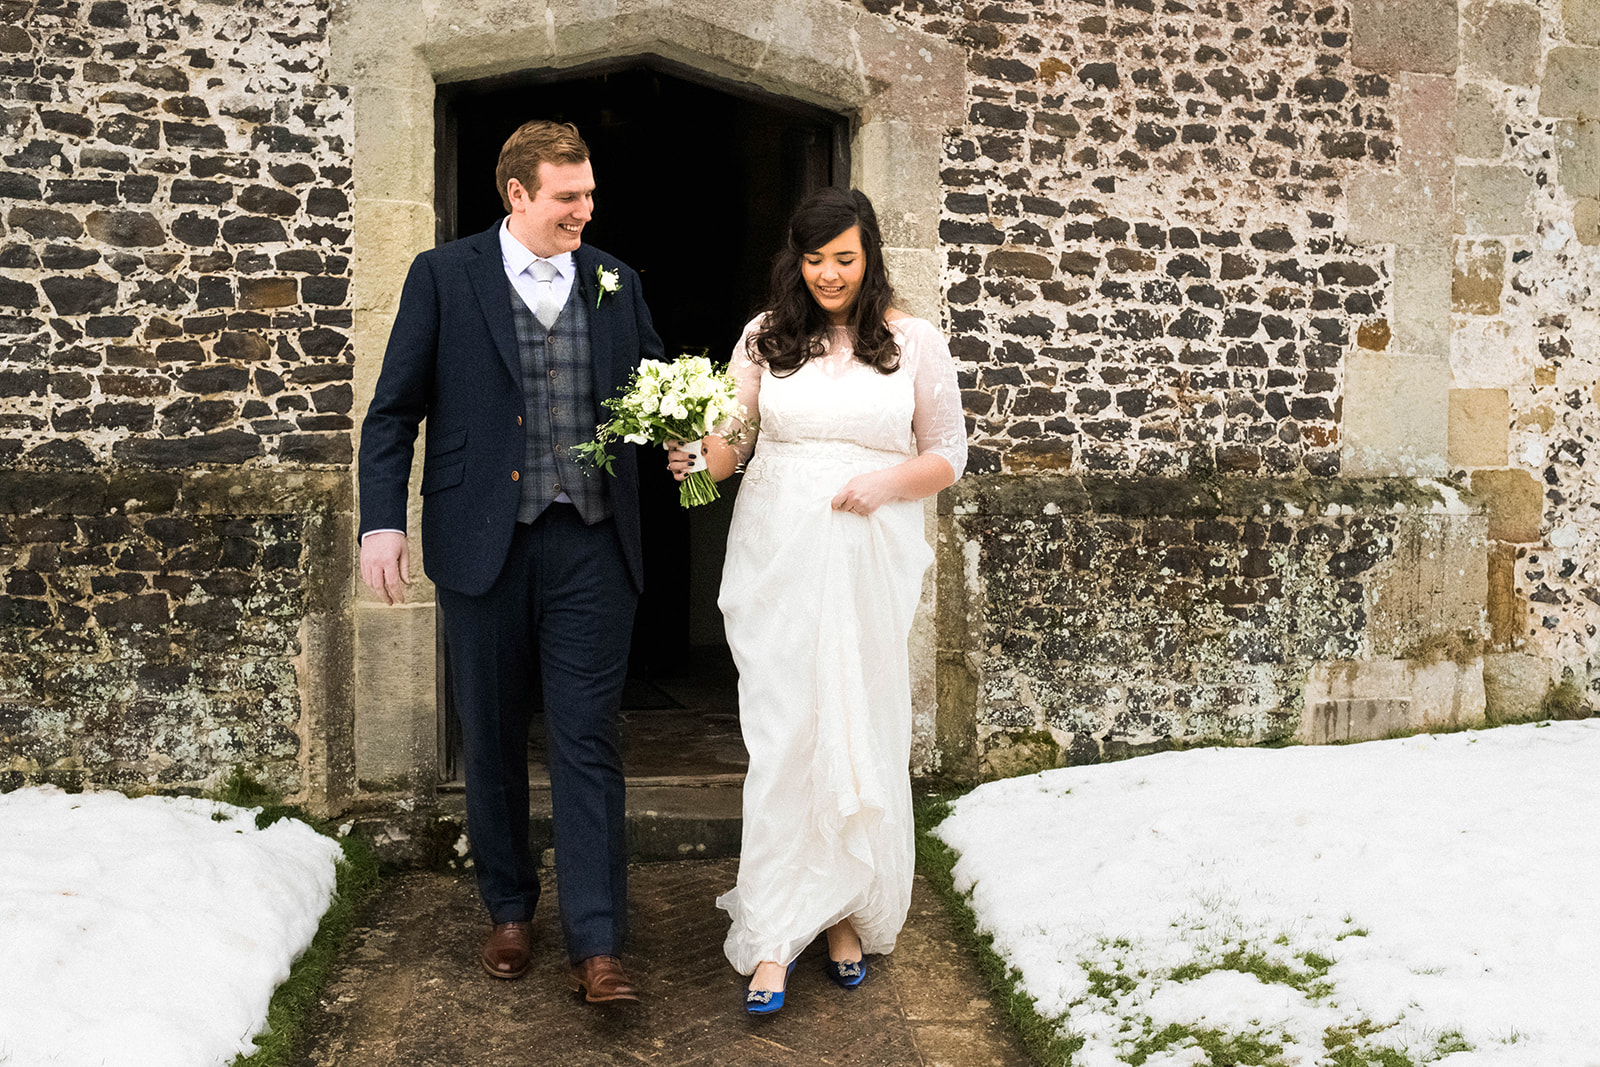 white embroidered wedding dress